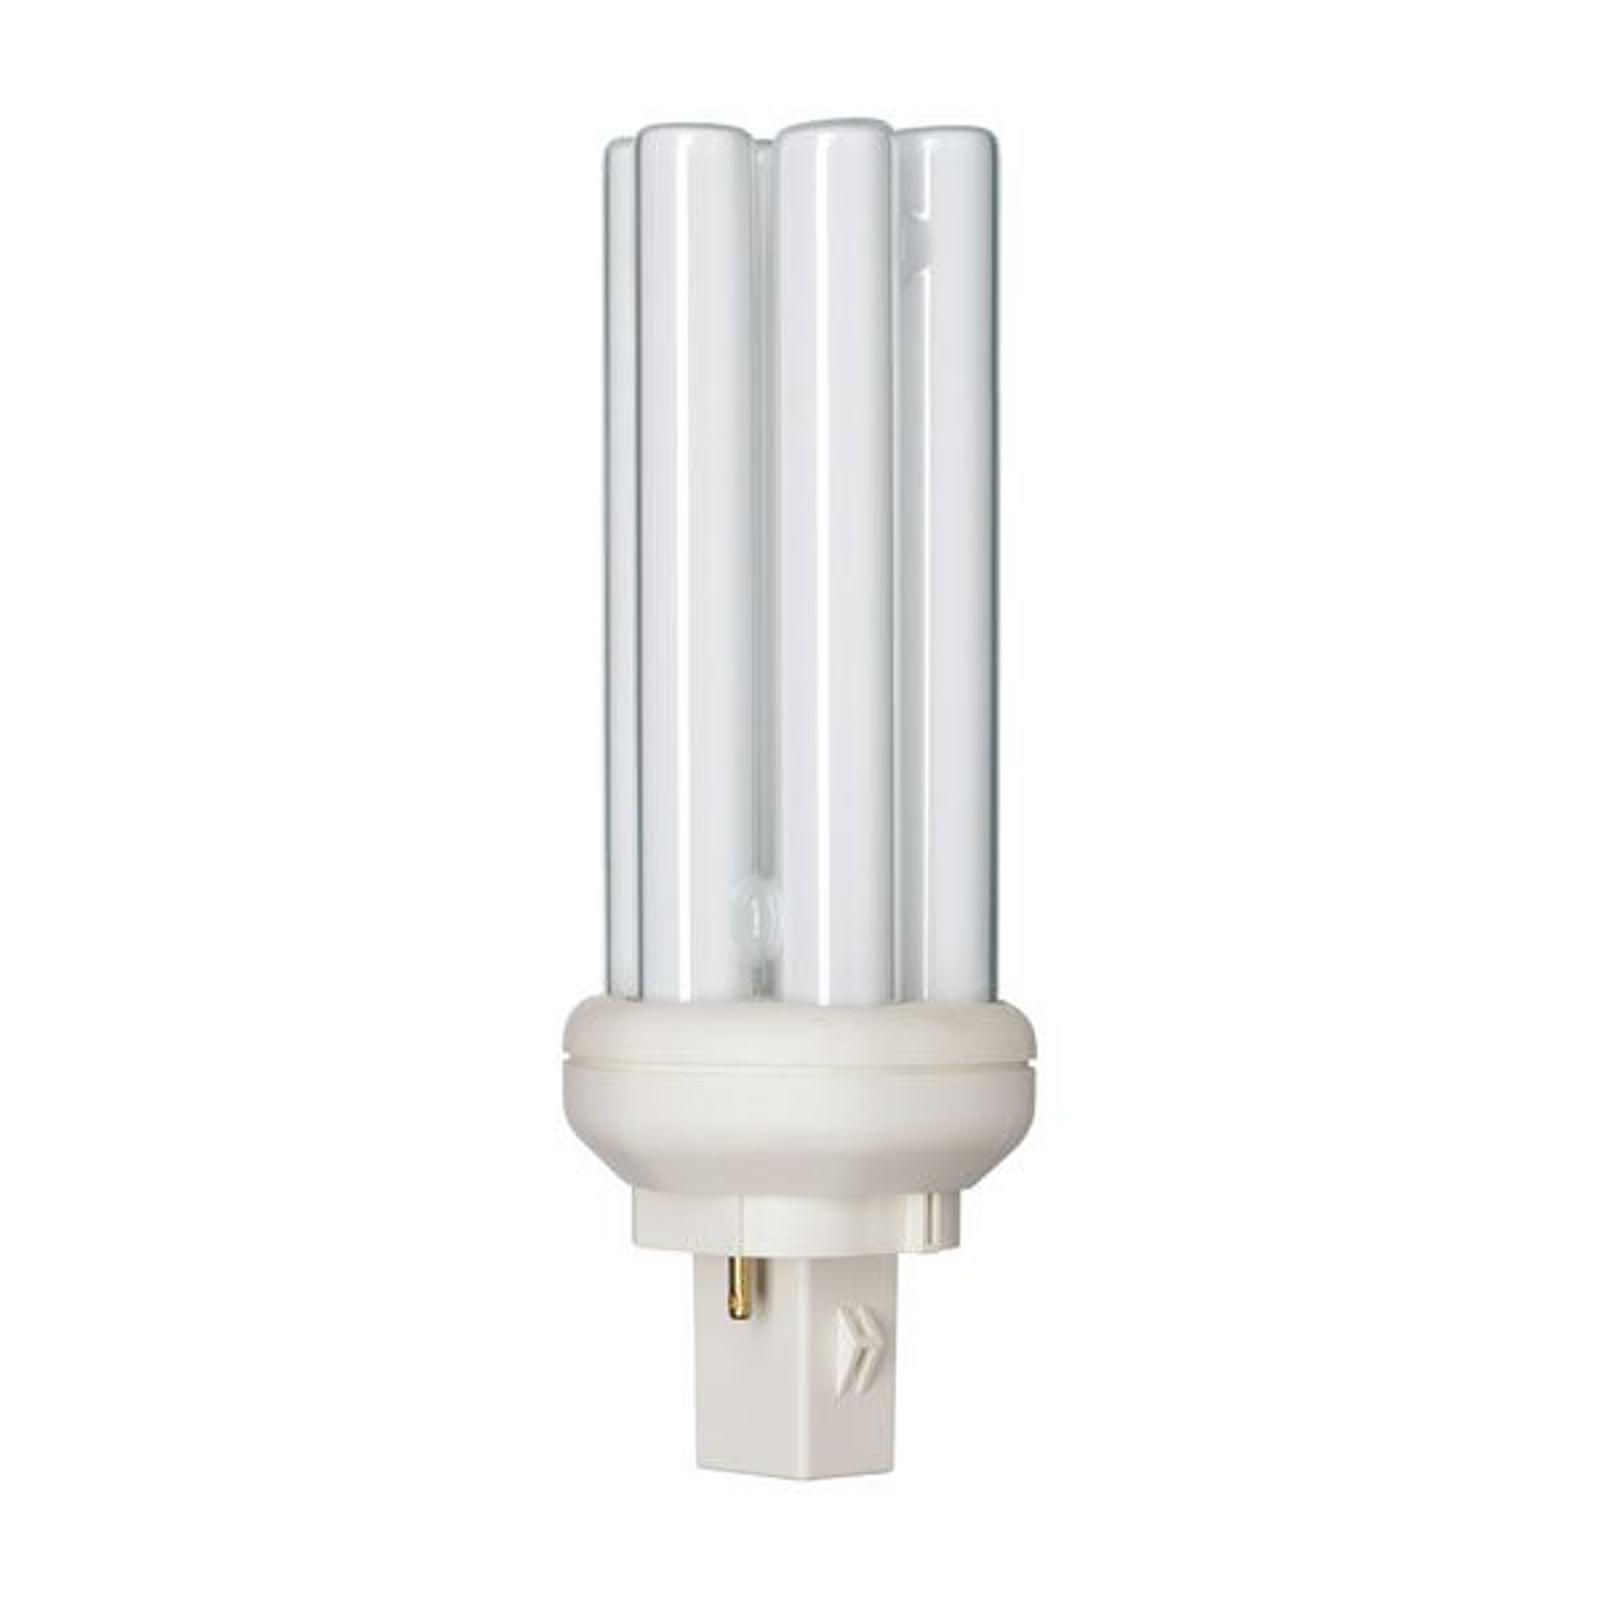 Lampadina a fluorescenza Master 18W PL-T 840